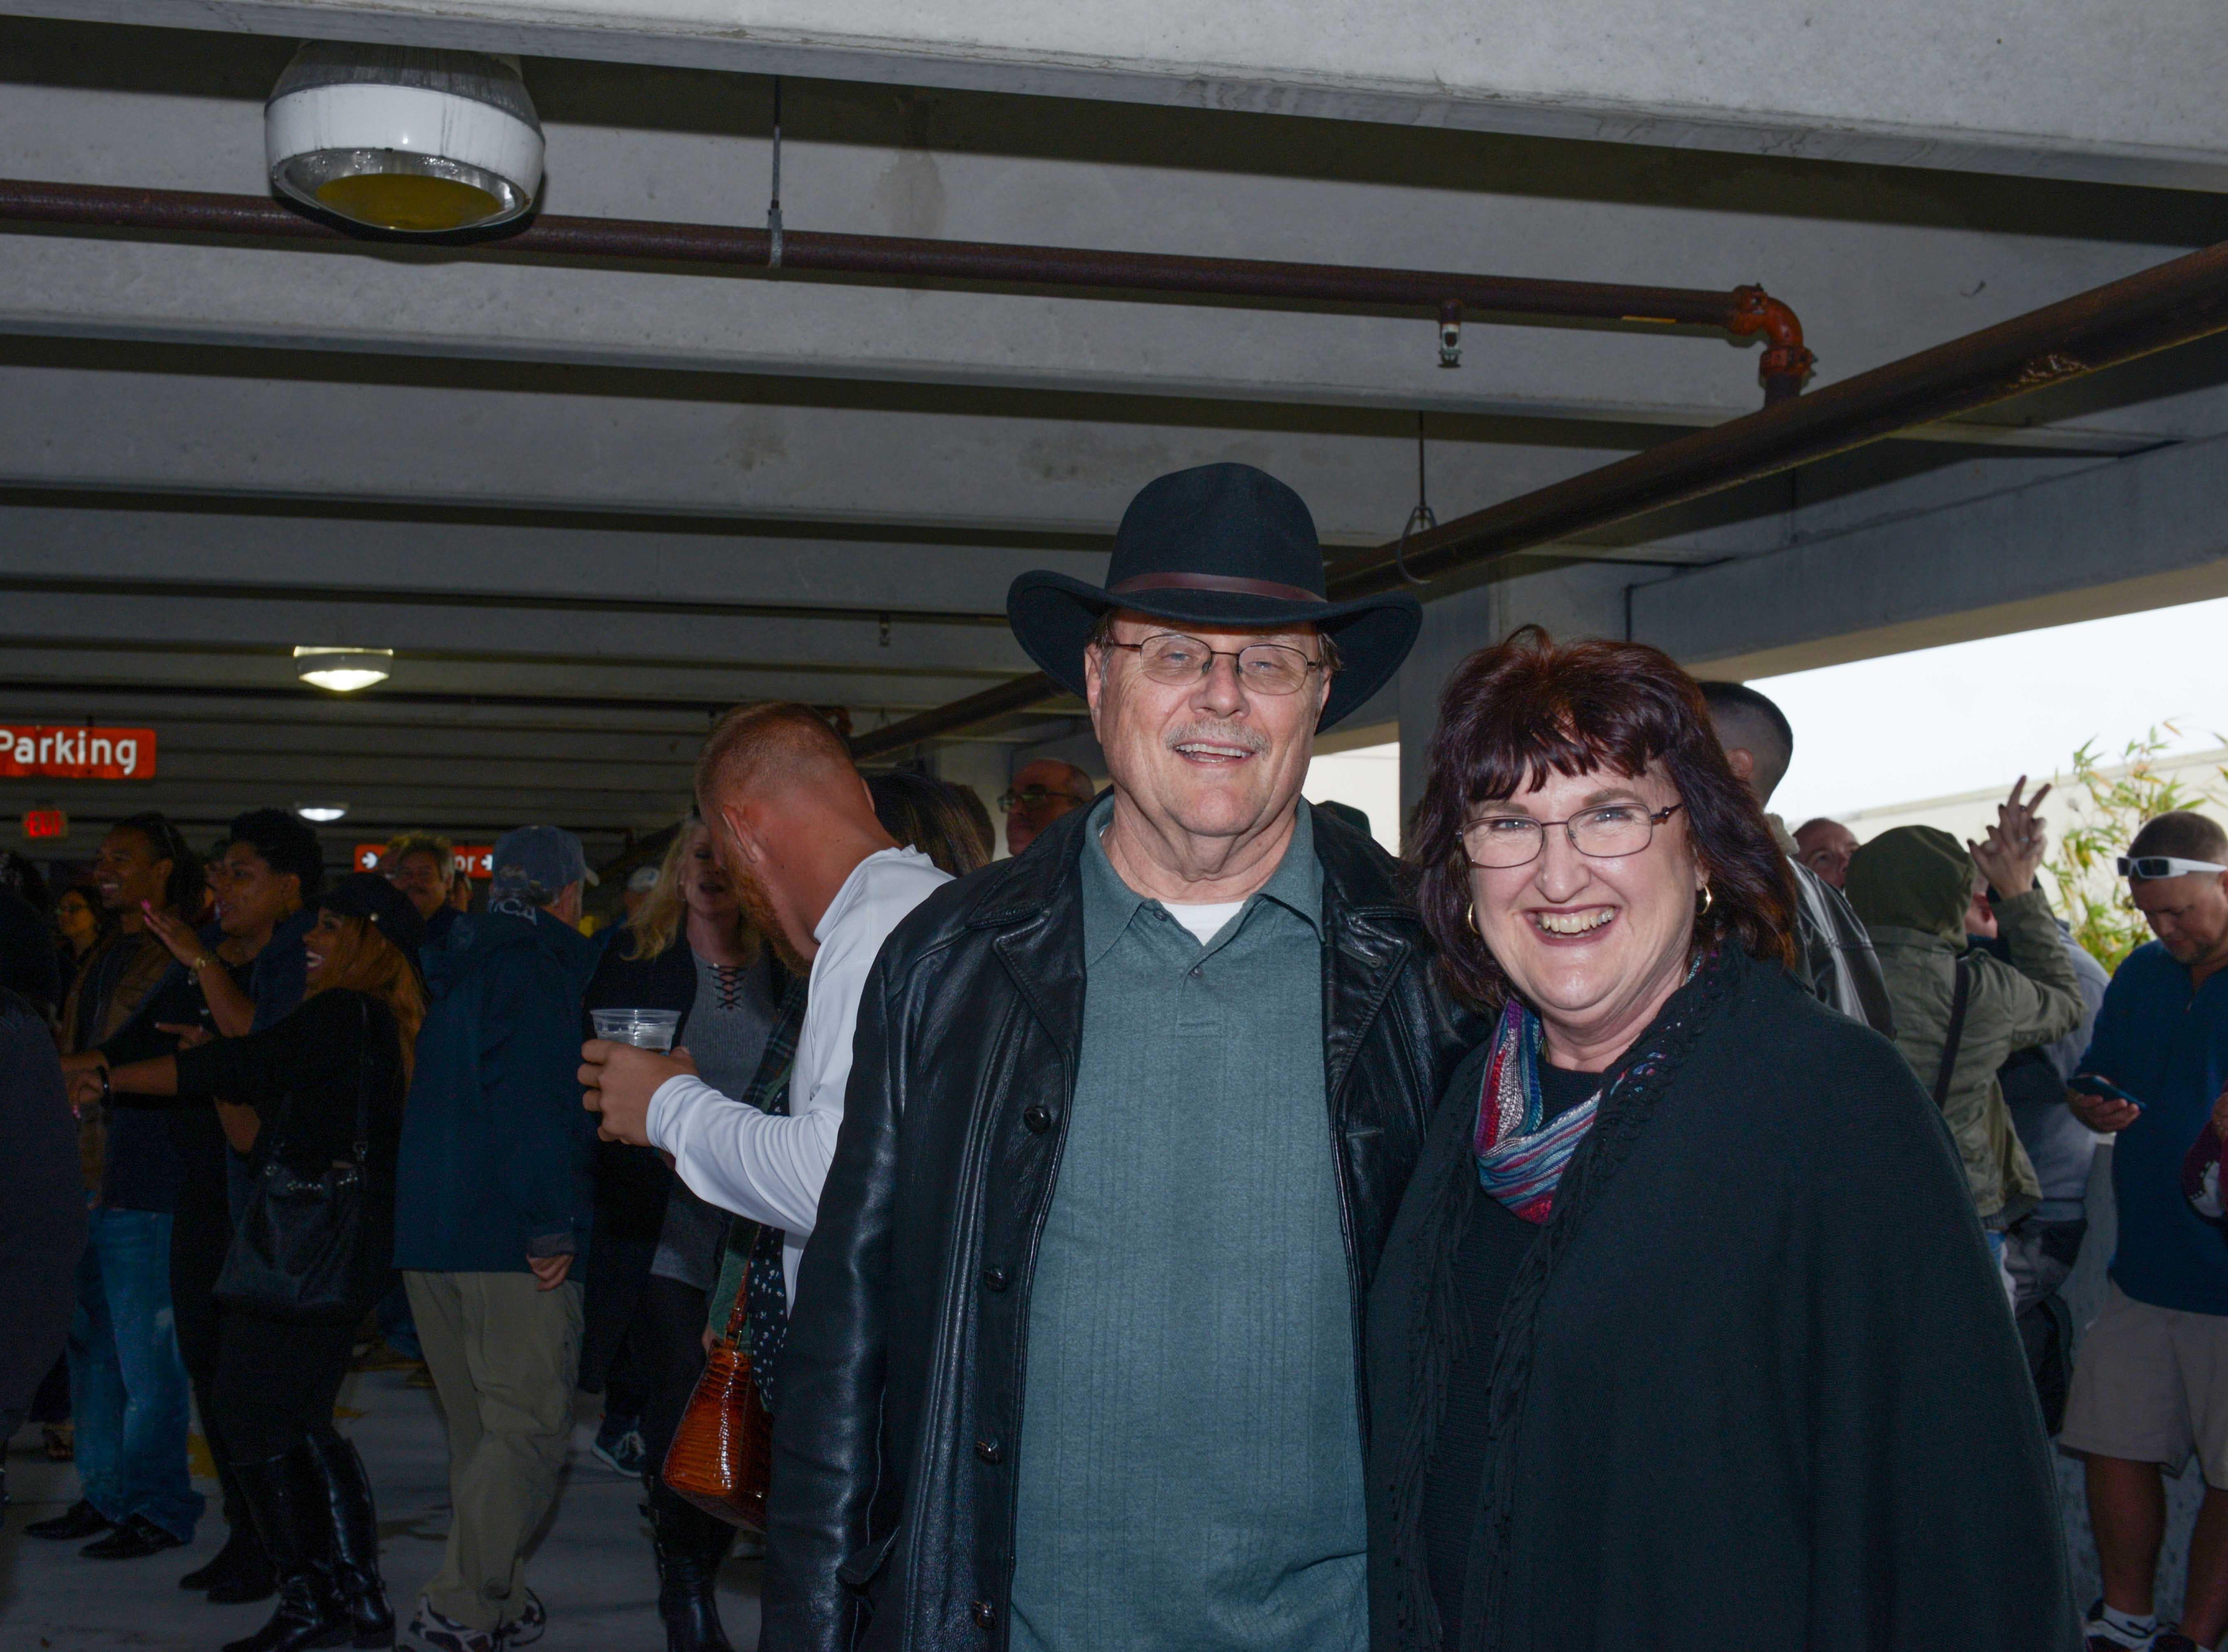 Carl and Kathryn Hensley at Bluebird Educational Foundation's Groovin' & Tastin' Sunrise City Wine & Spirits Fest.